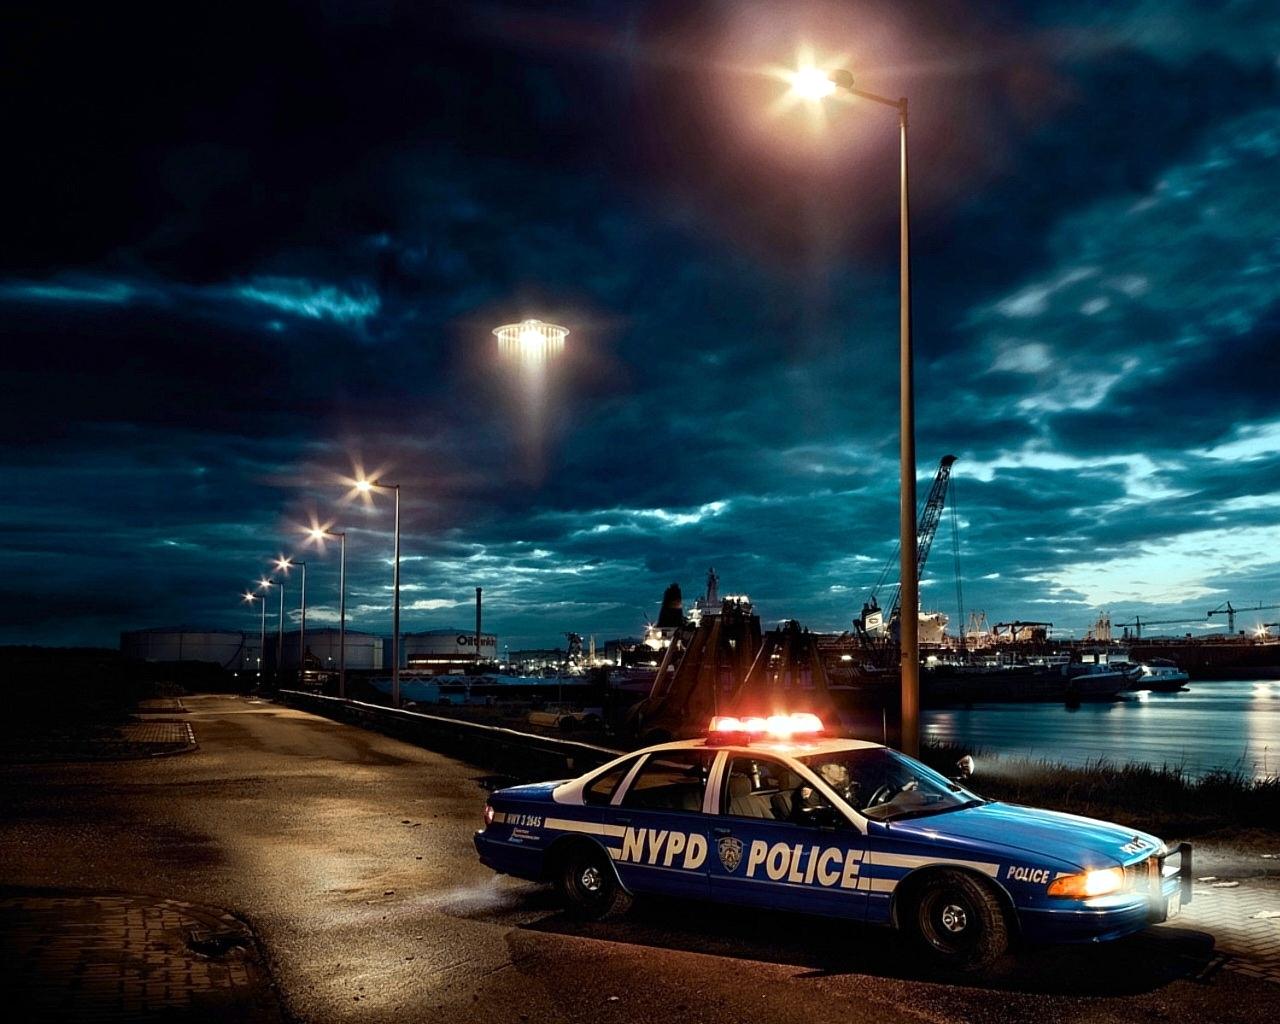 Police Car Wallpaper Police Car at Night